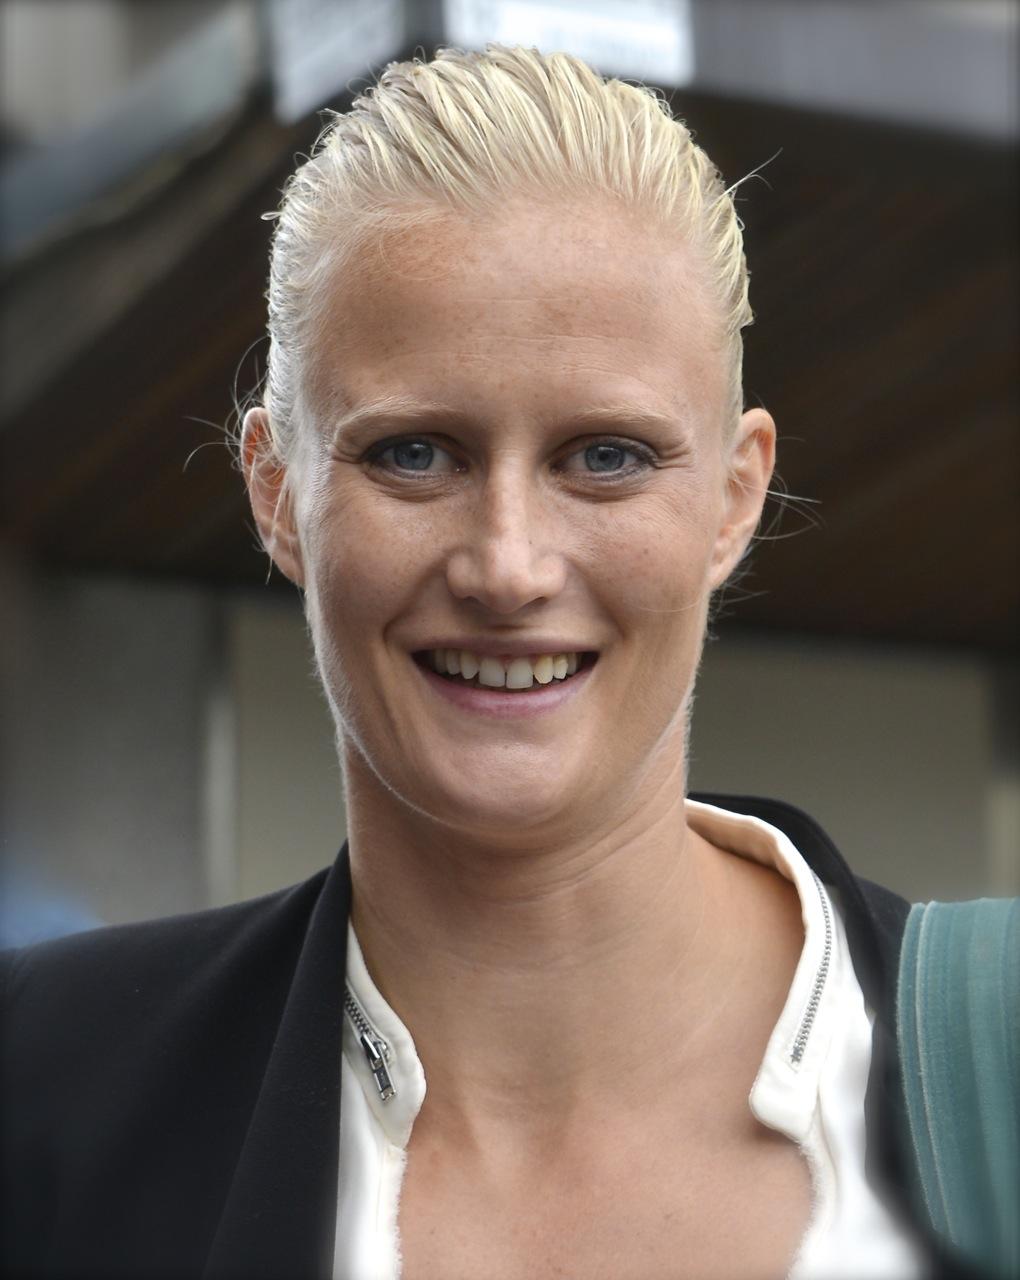 Carolina Klüft in september 2014 Blonde Hair With Platinum Highlights